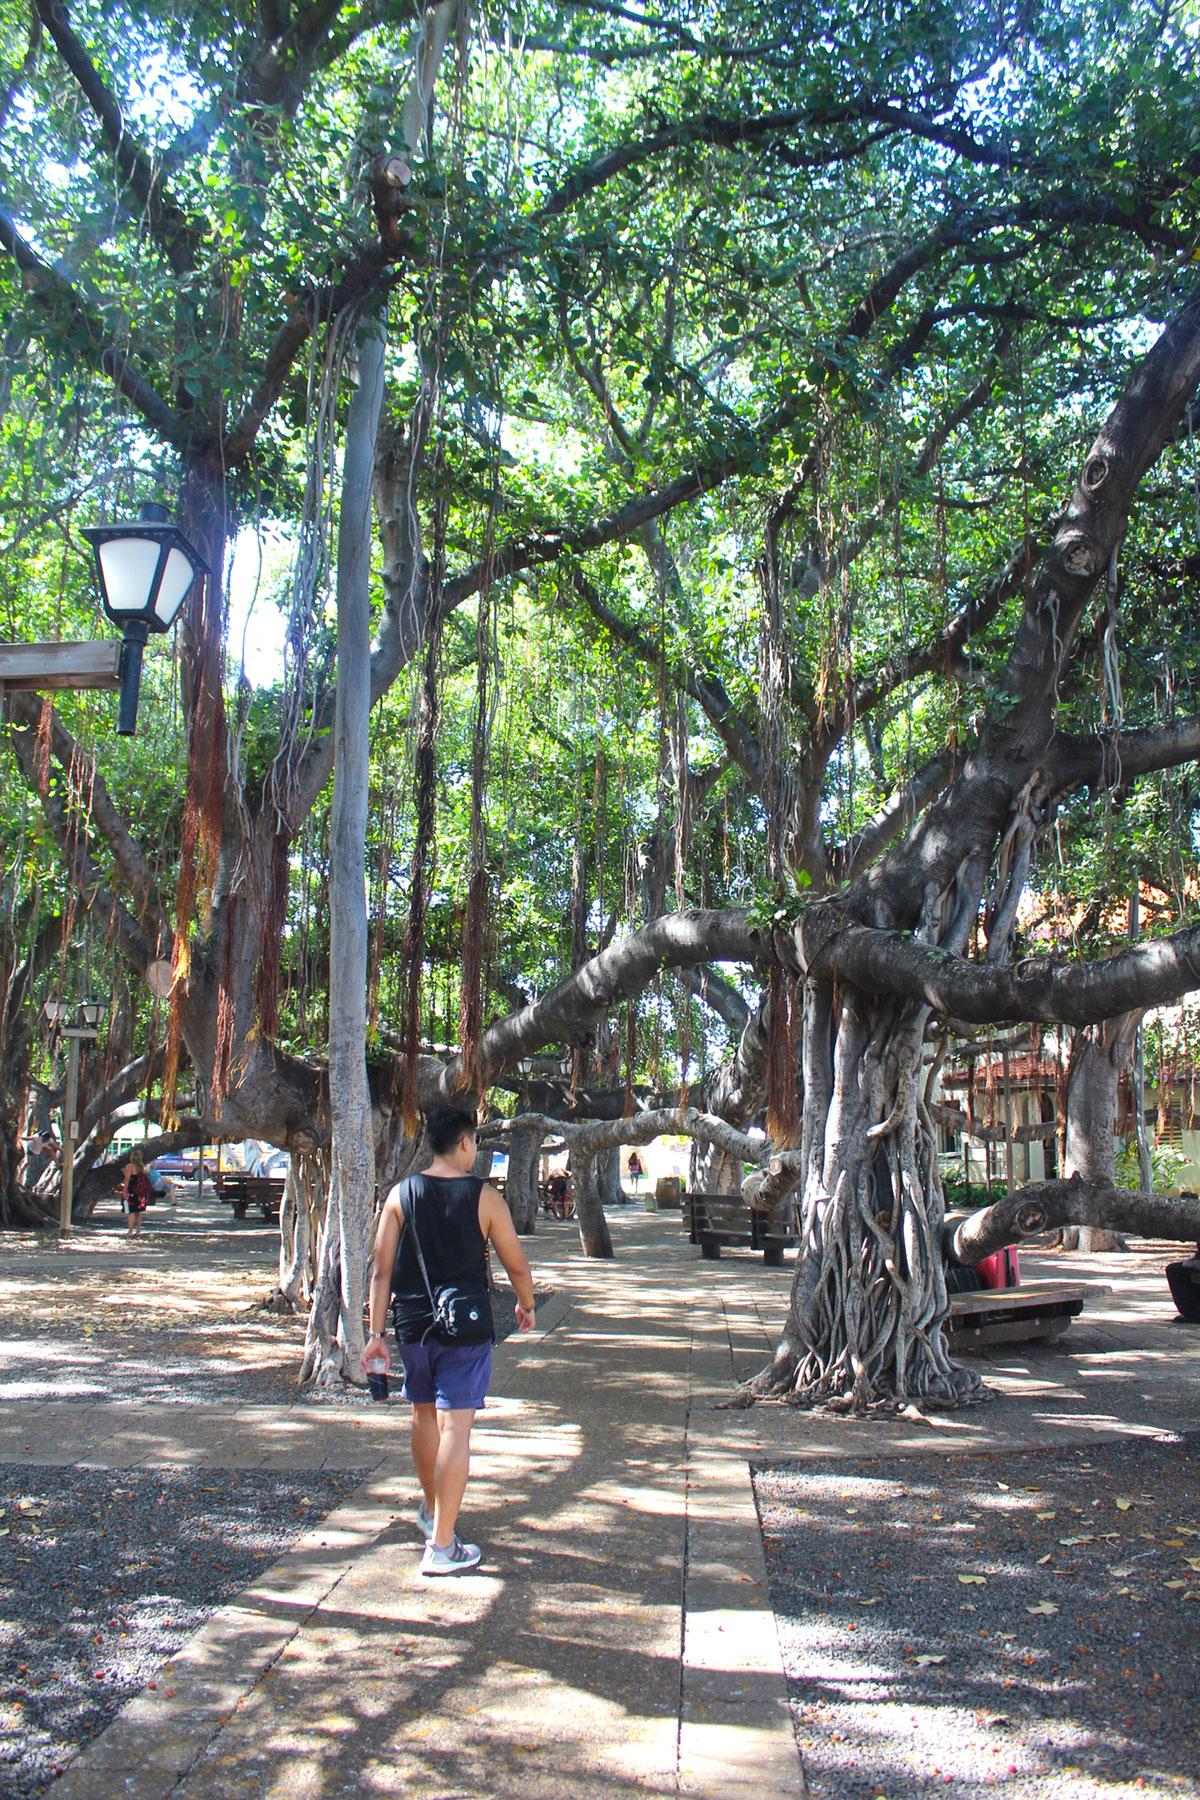 Old Banyan Tree, Maui - PearlMargaret.com